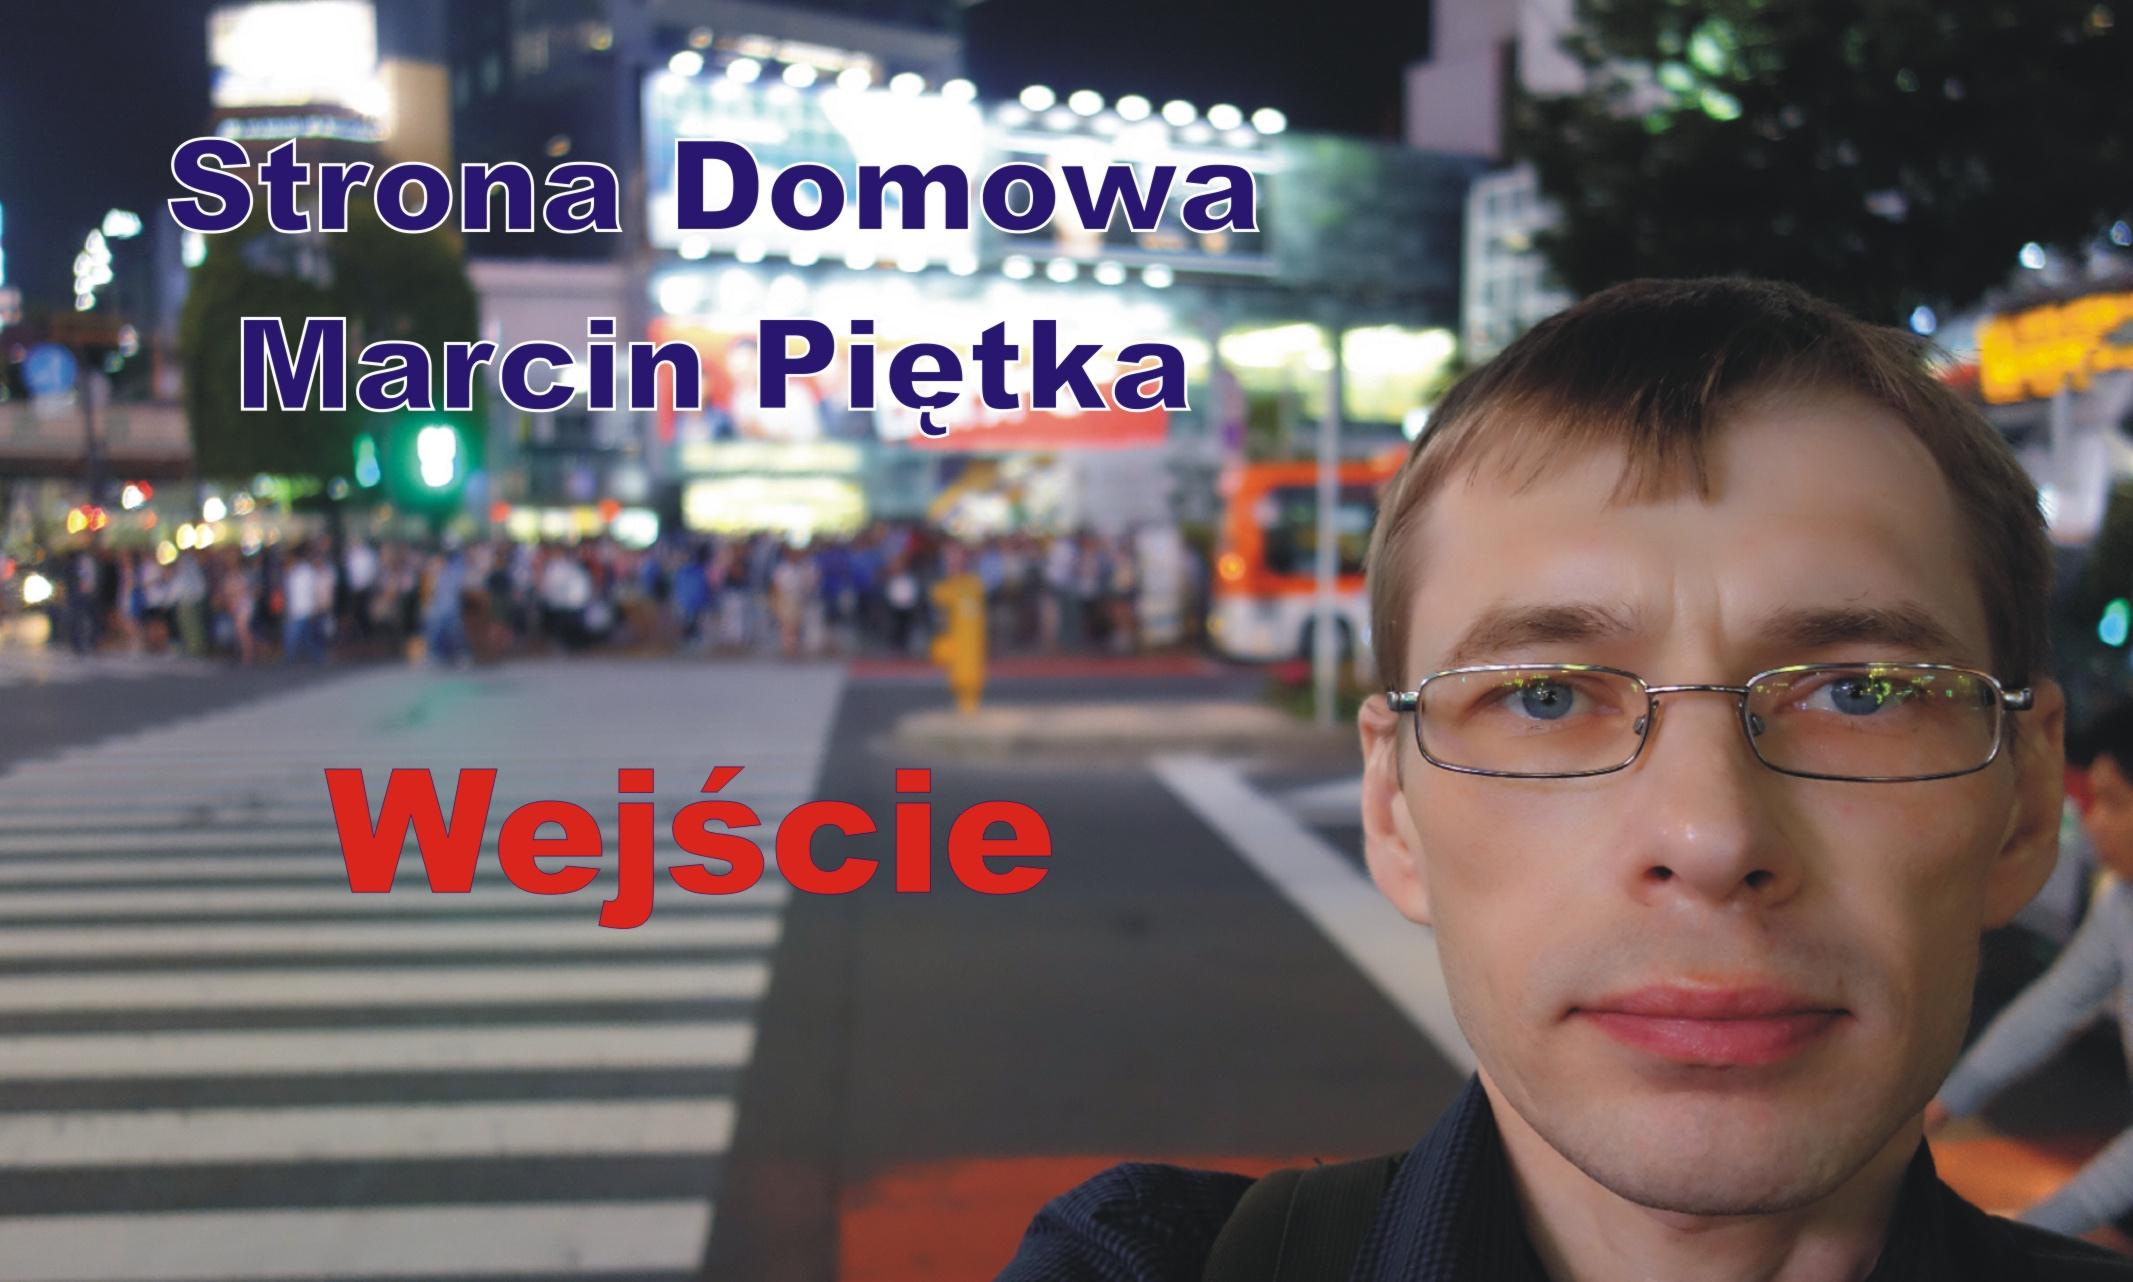 Marcin Piętka